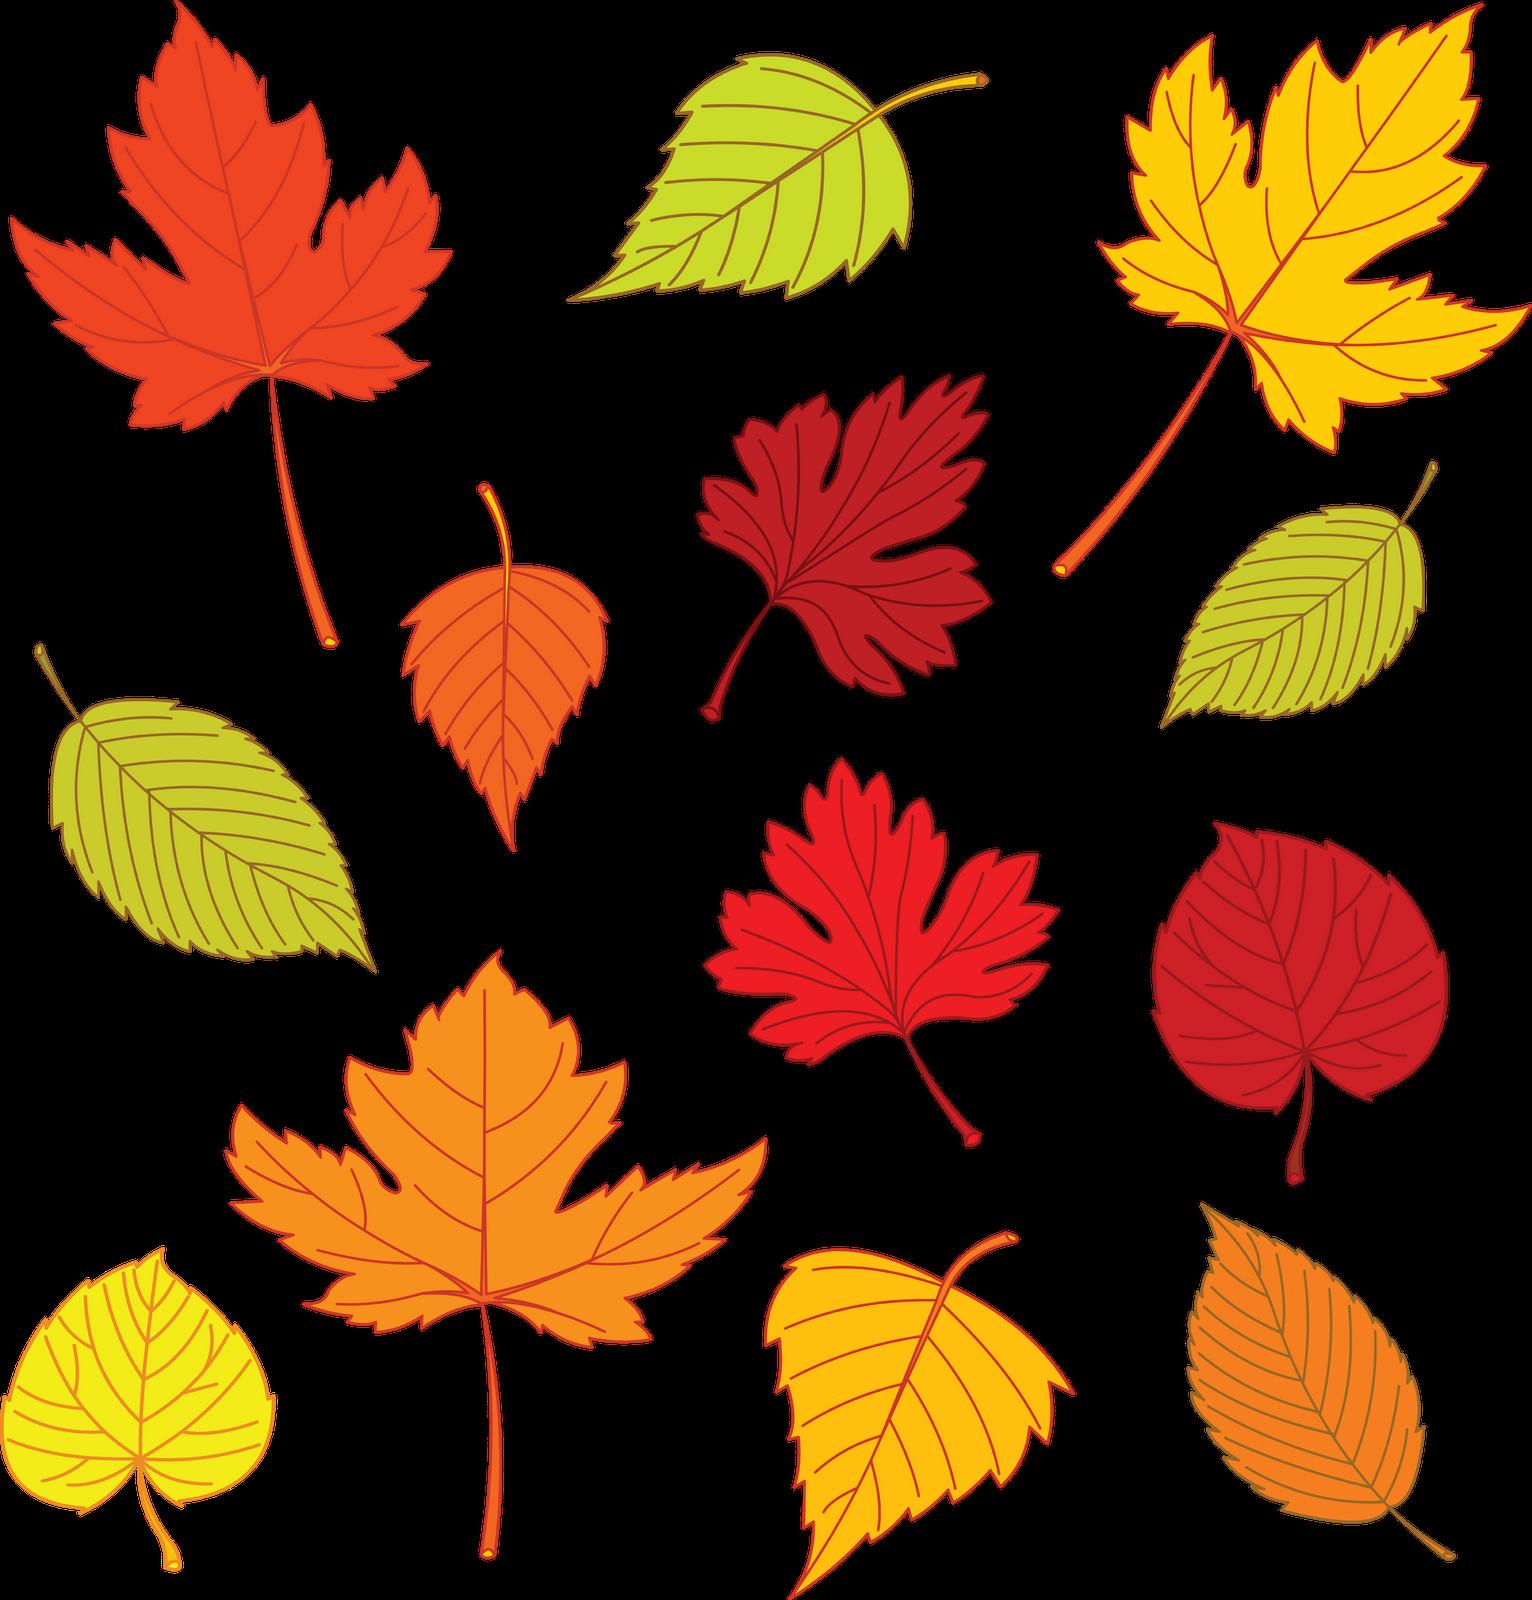 Leaf Drawing Template at GetDrawings | Free download